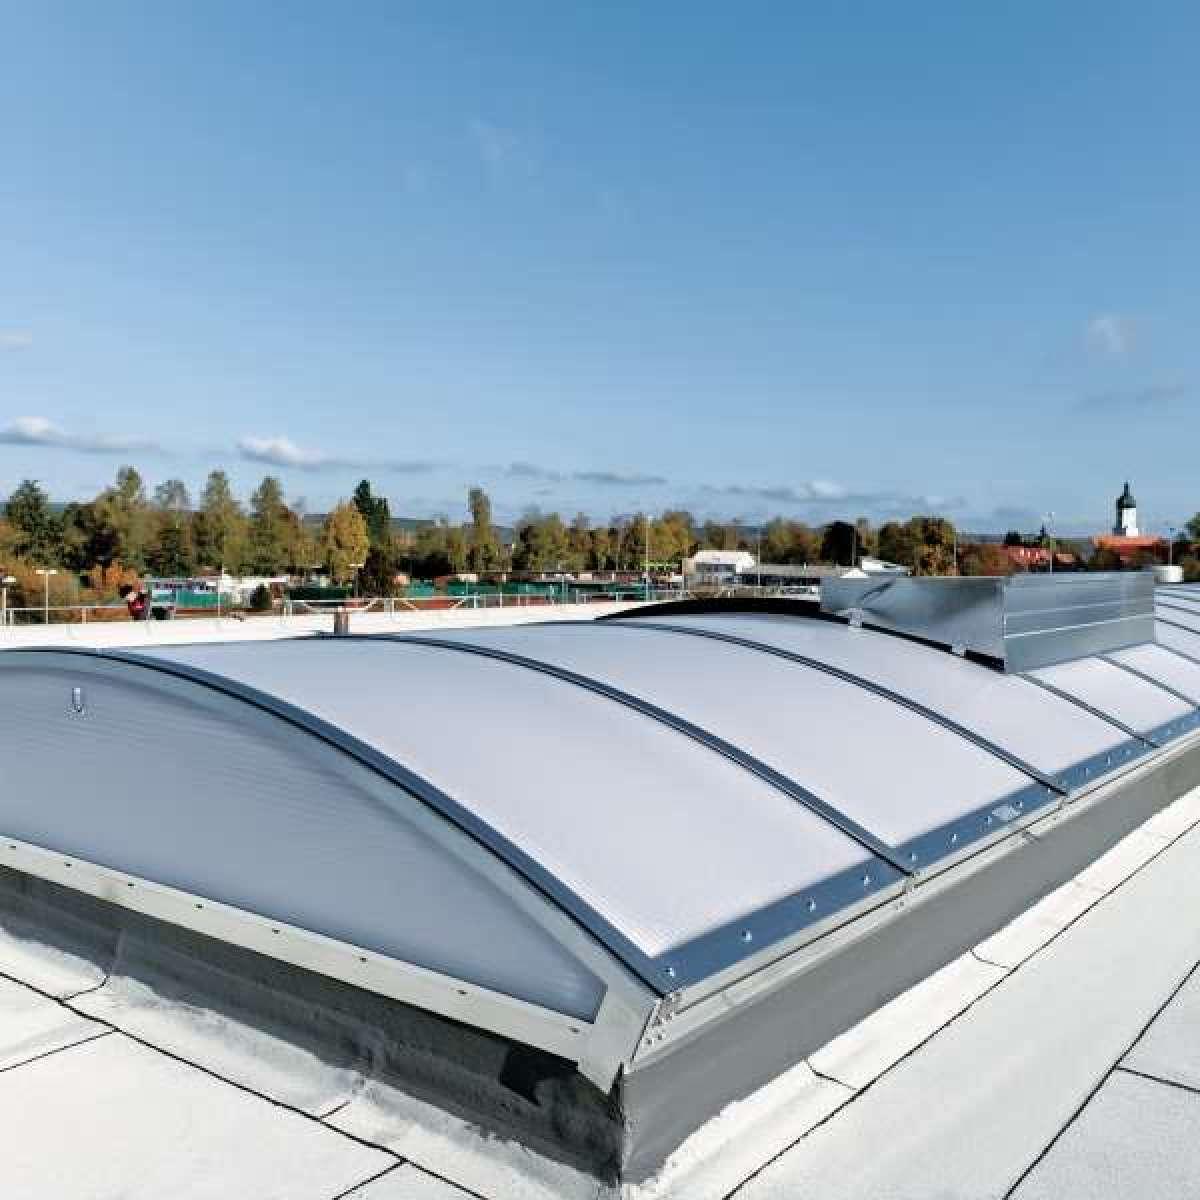 Ablachhalle (Sports hall) | Mengen • 2 x Topline ELS 38 m x 3 m, 6NSHEV flaps